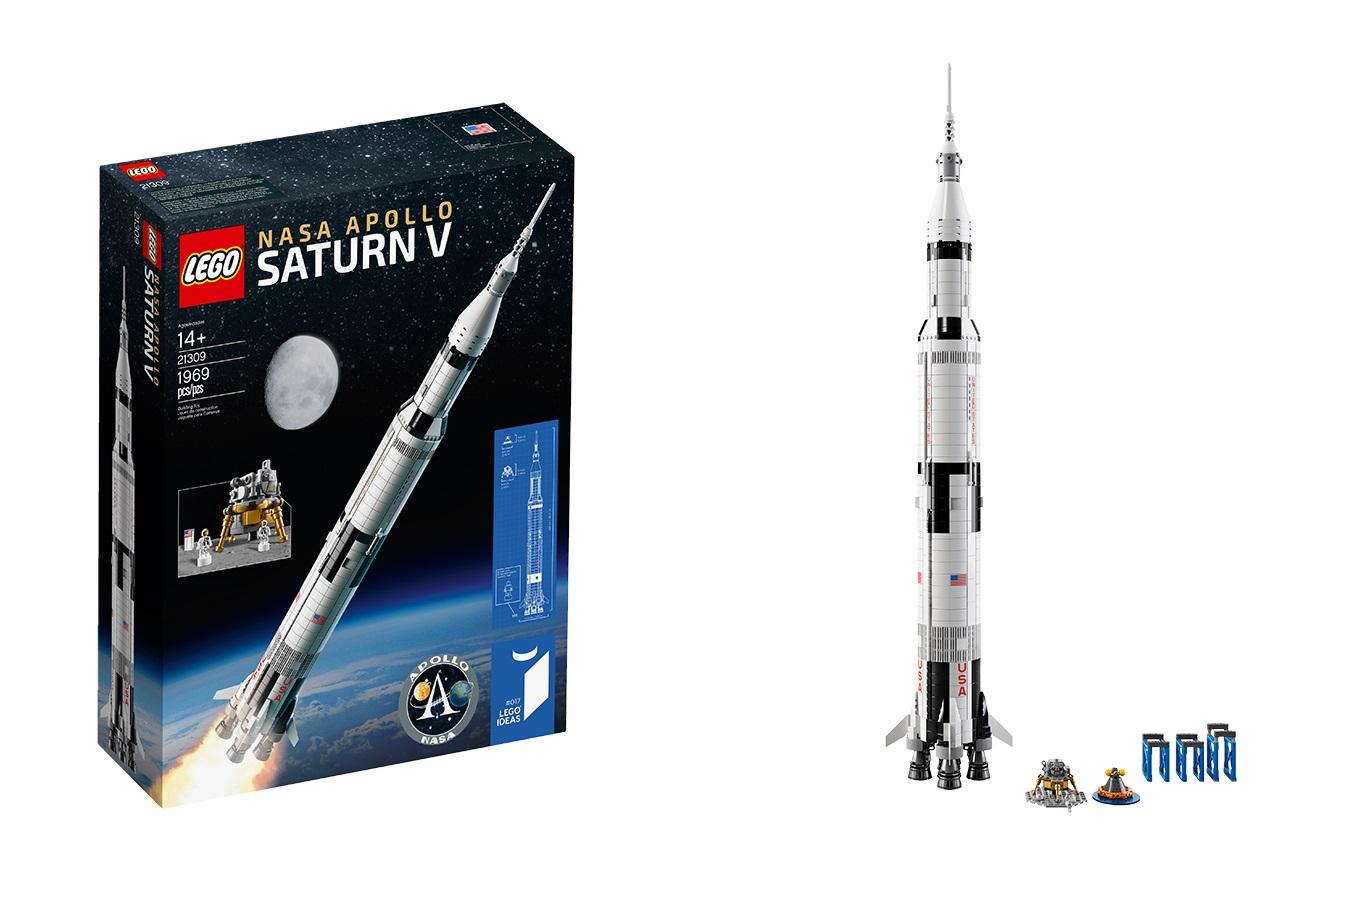 Blast off with LEGO Ideas 21309 NASA Apollo Saturn V!